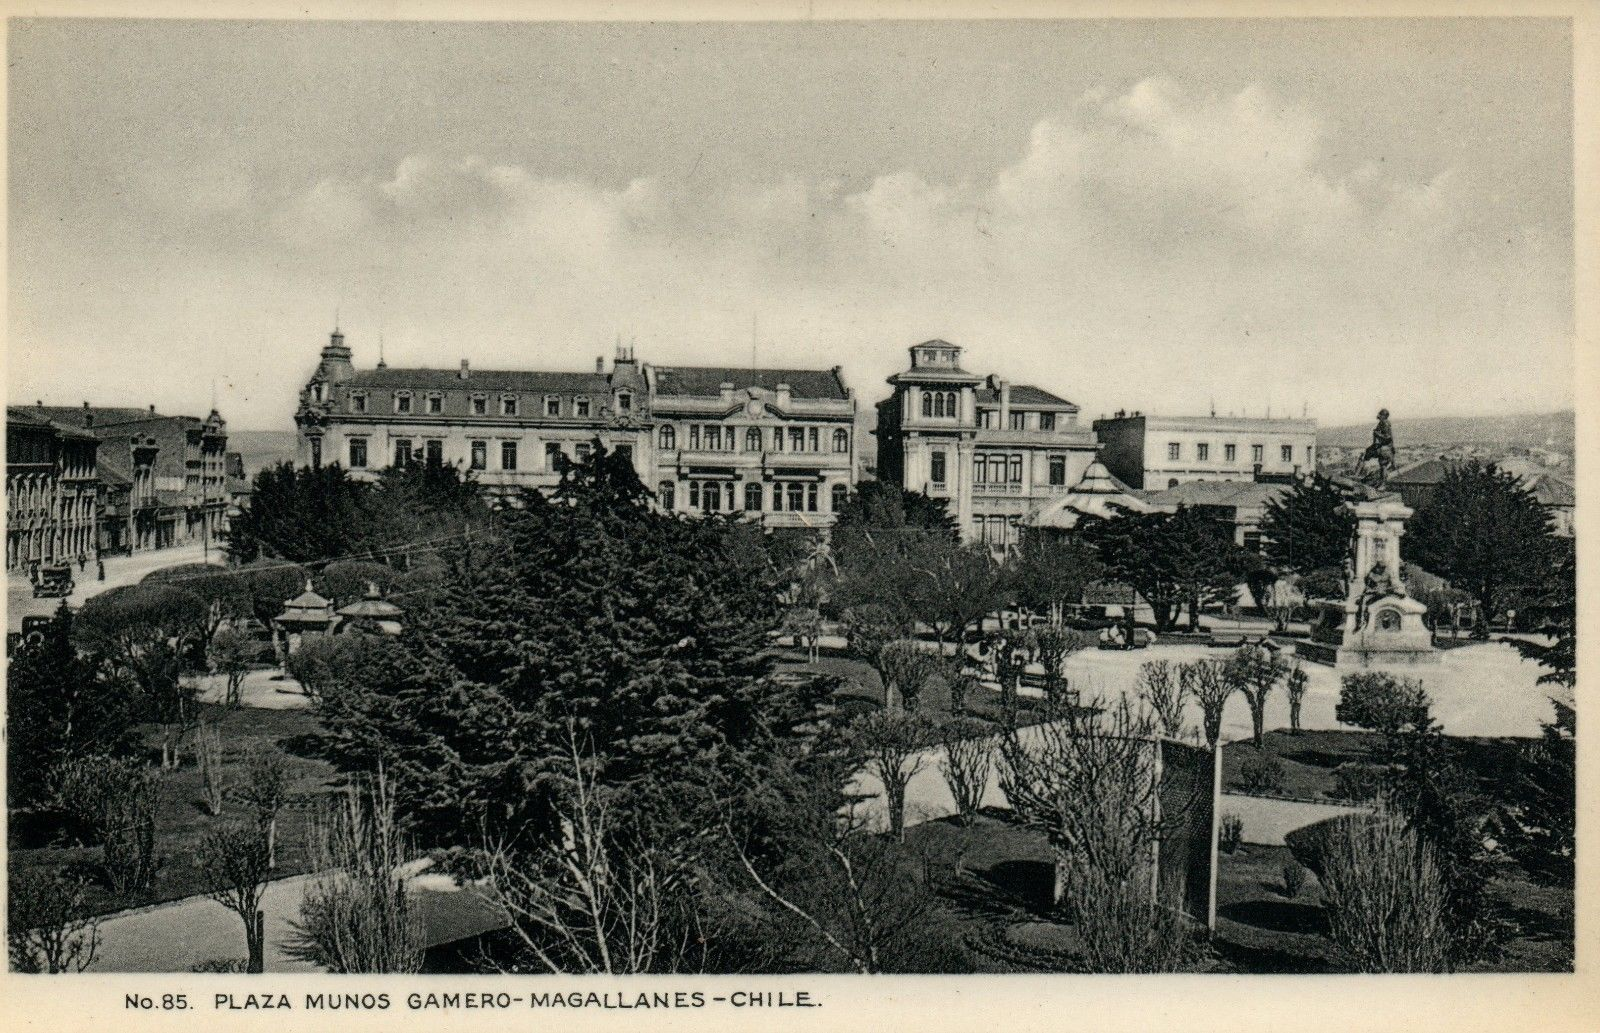 Enterreno - Fotos históricas de chile - fotos antiguas de Chile - Plaza Muñoz Gamero de Punta Arenas, 1930